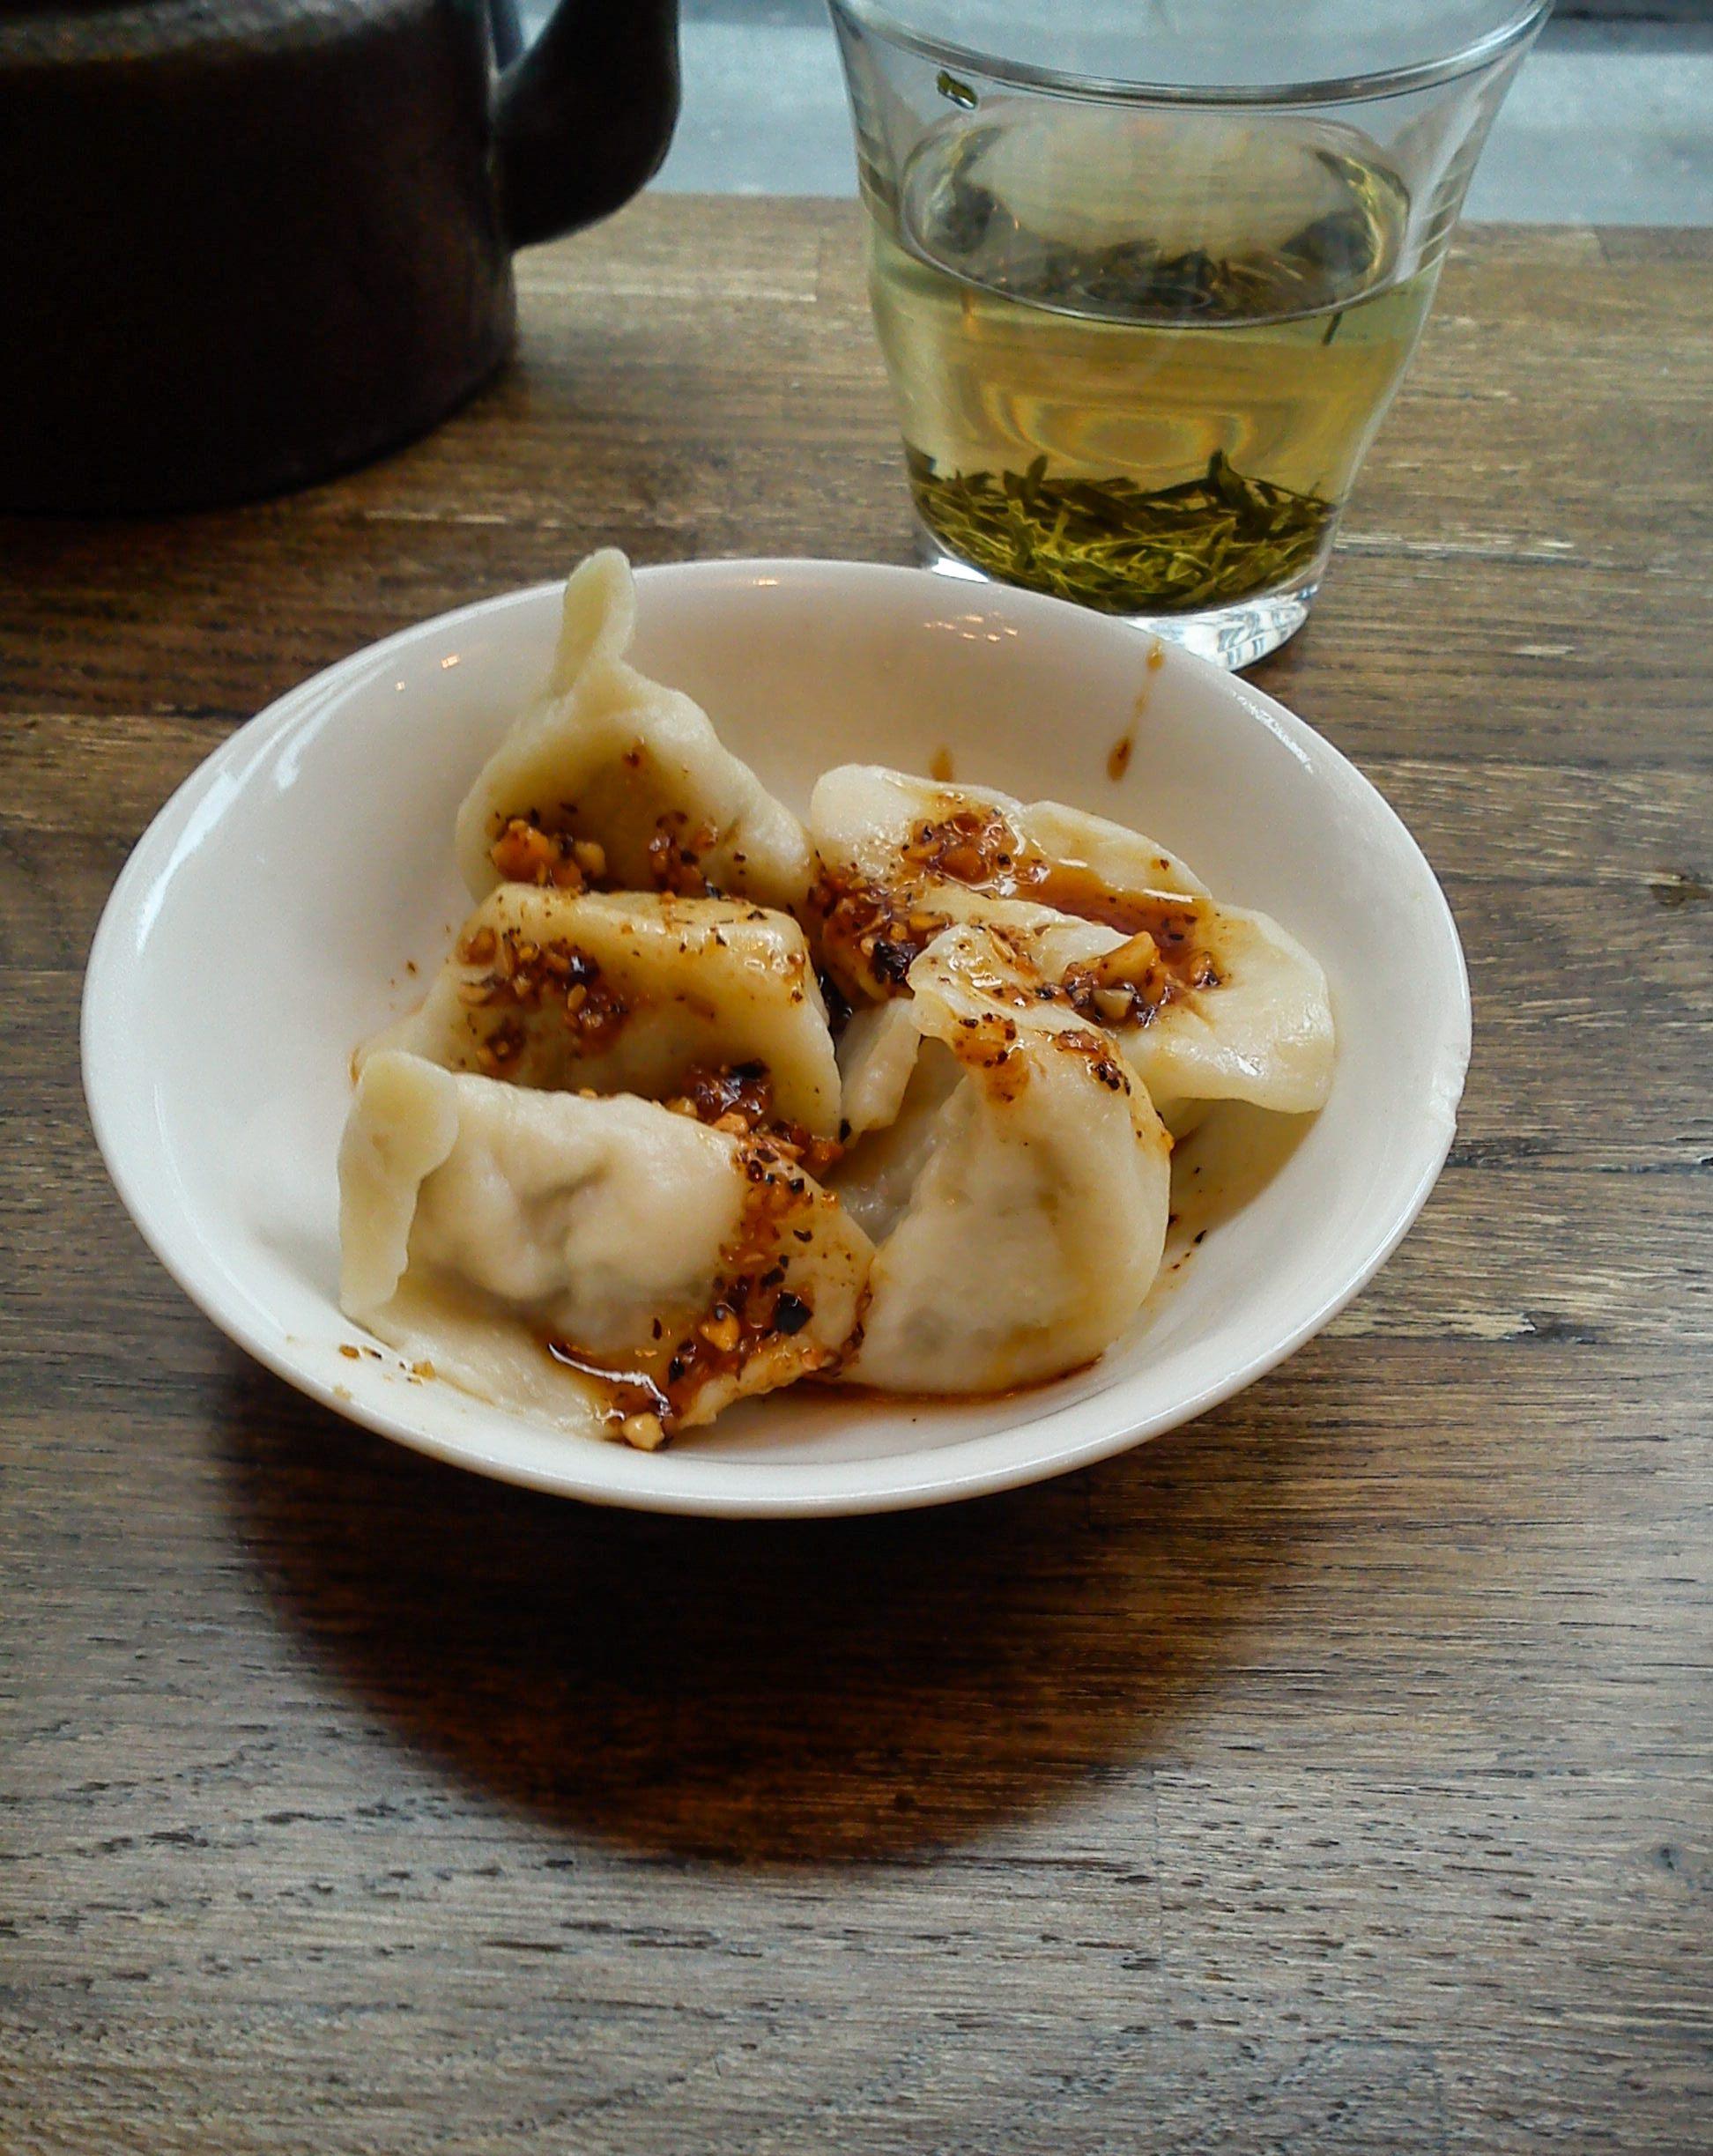 Sichuan piquant